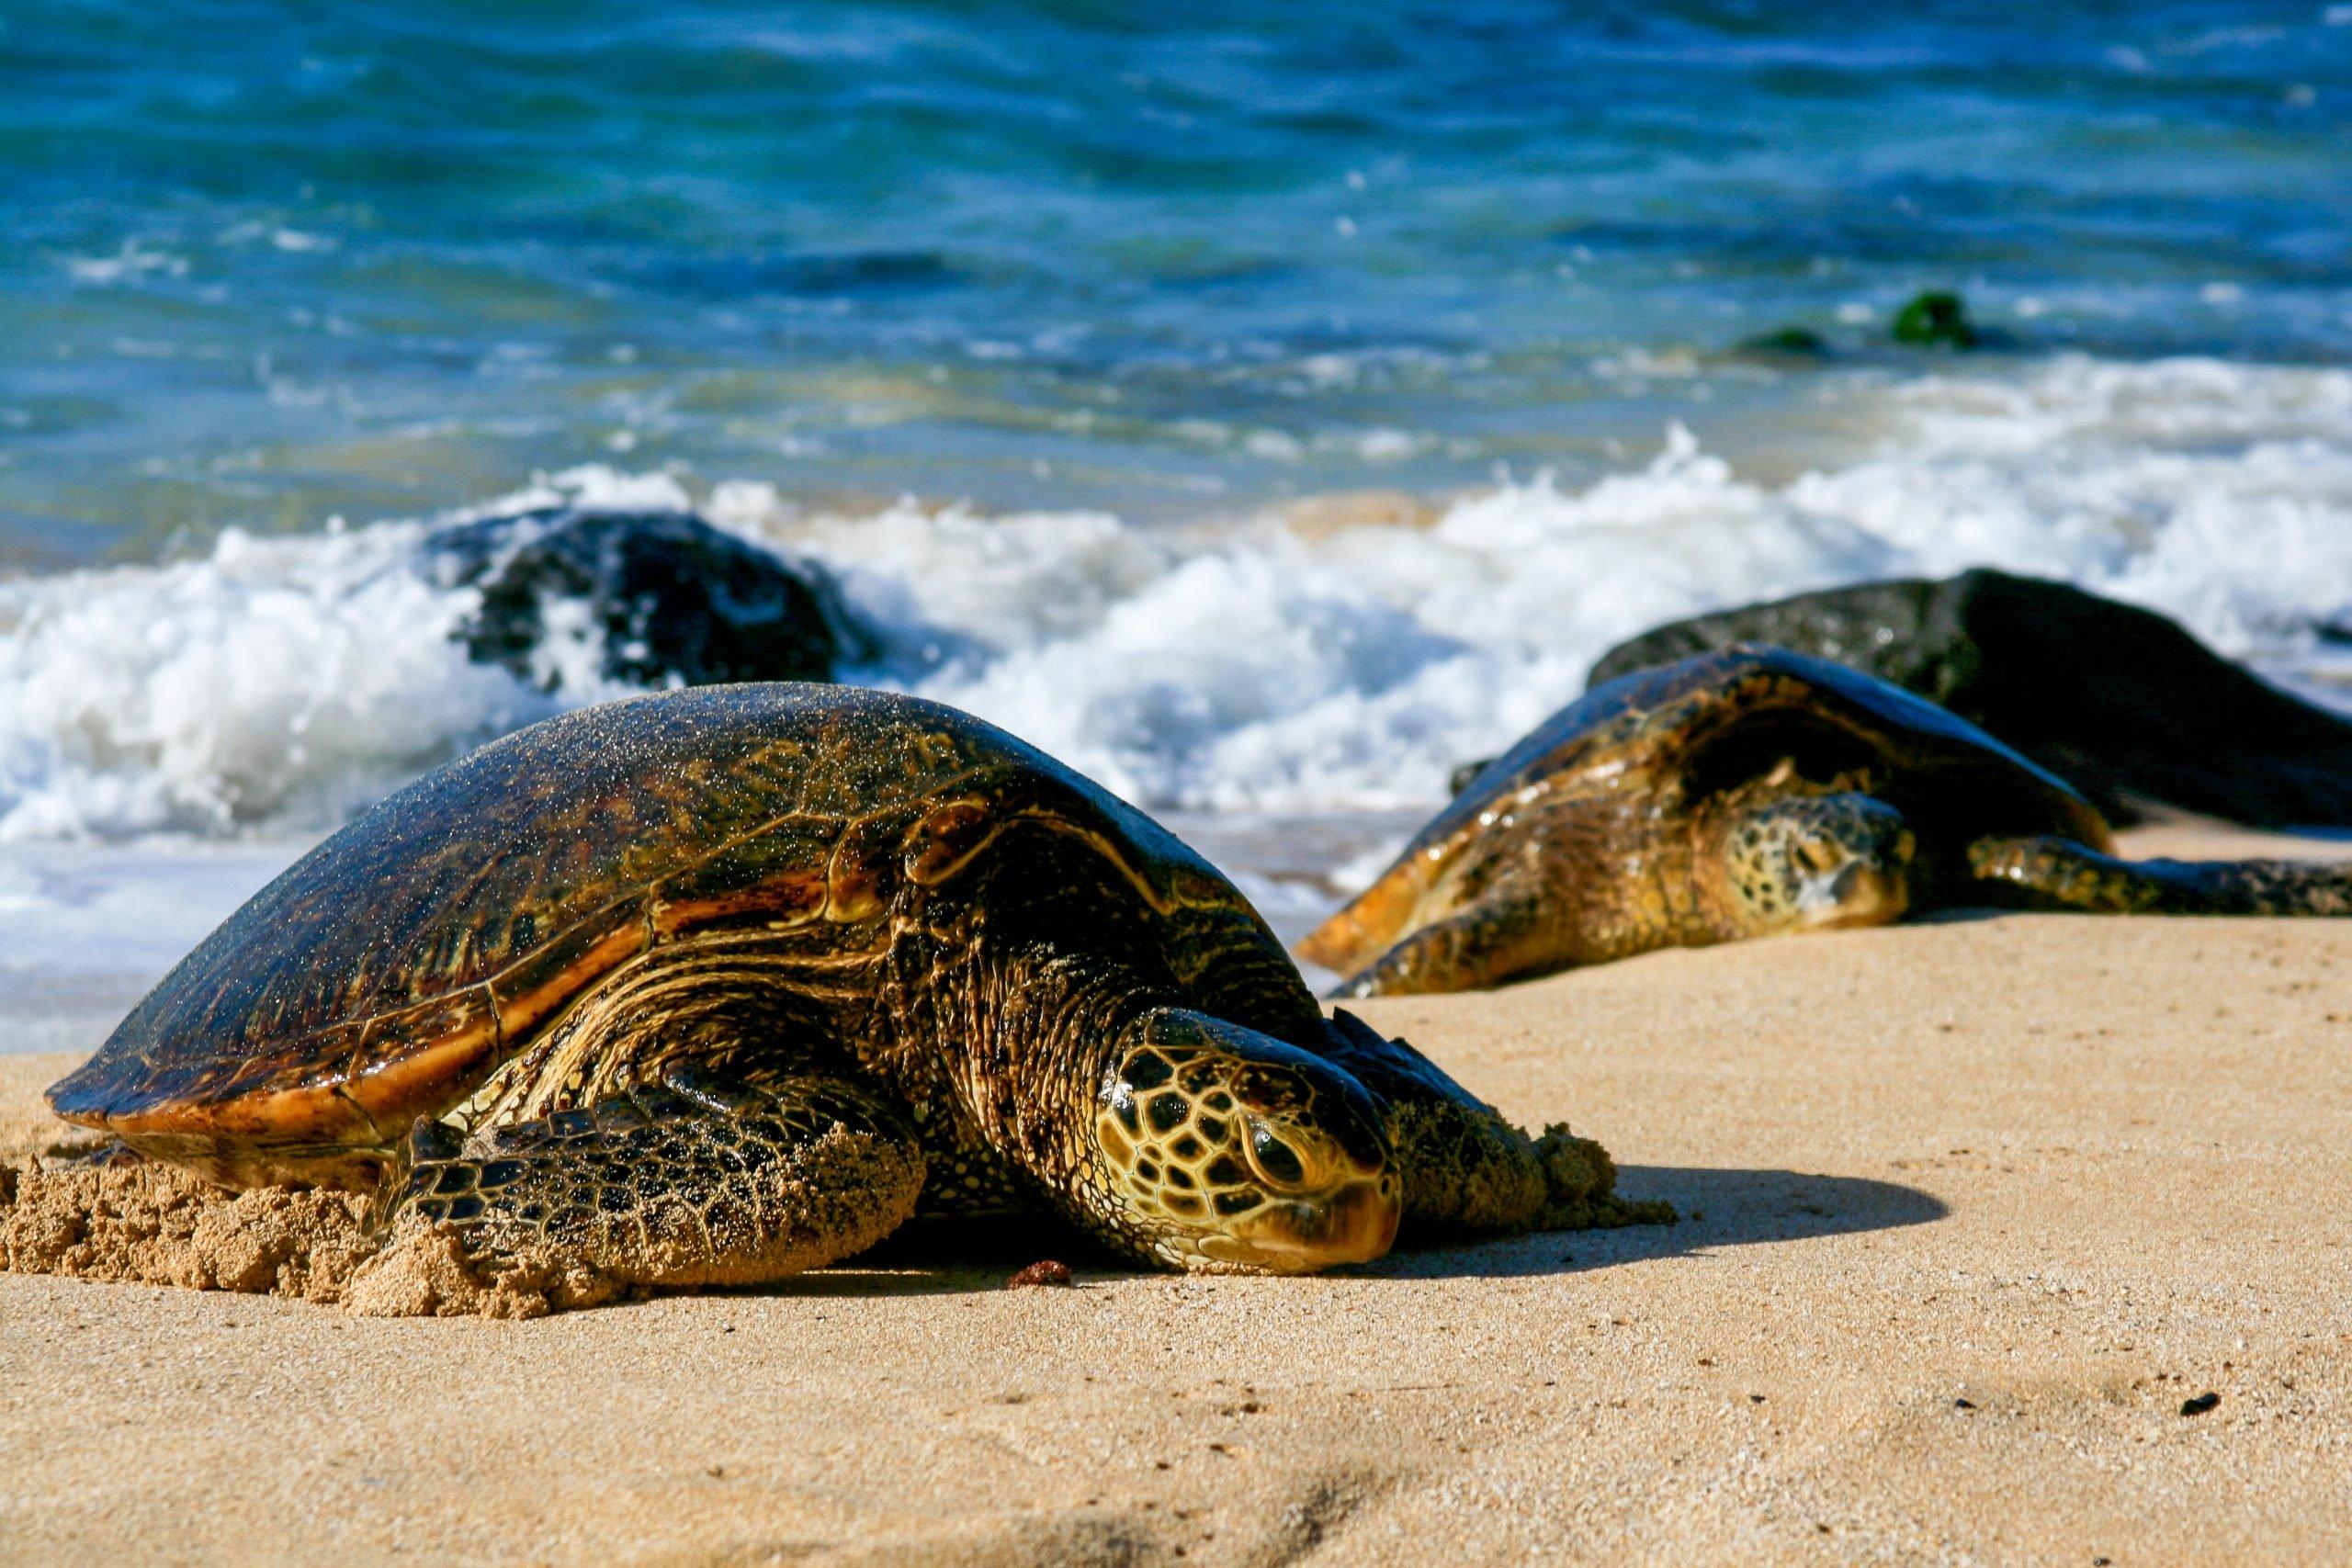 green sea turtle slow on land